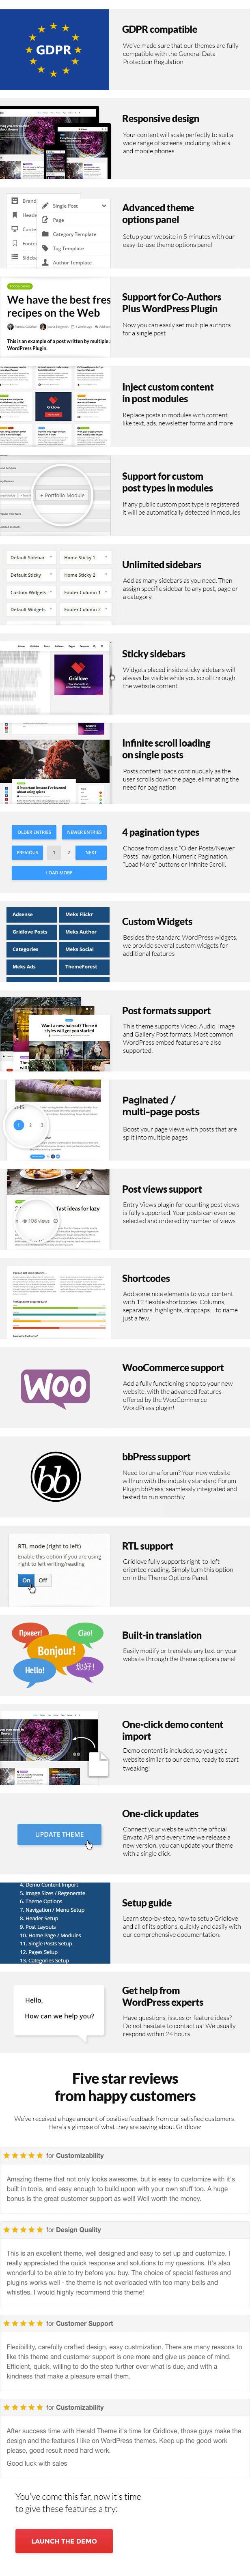 gridlove features part02 v2 - Gridlove - News Portal & Magazine WordPress Theme